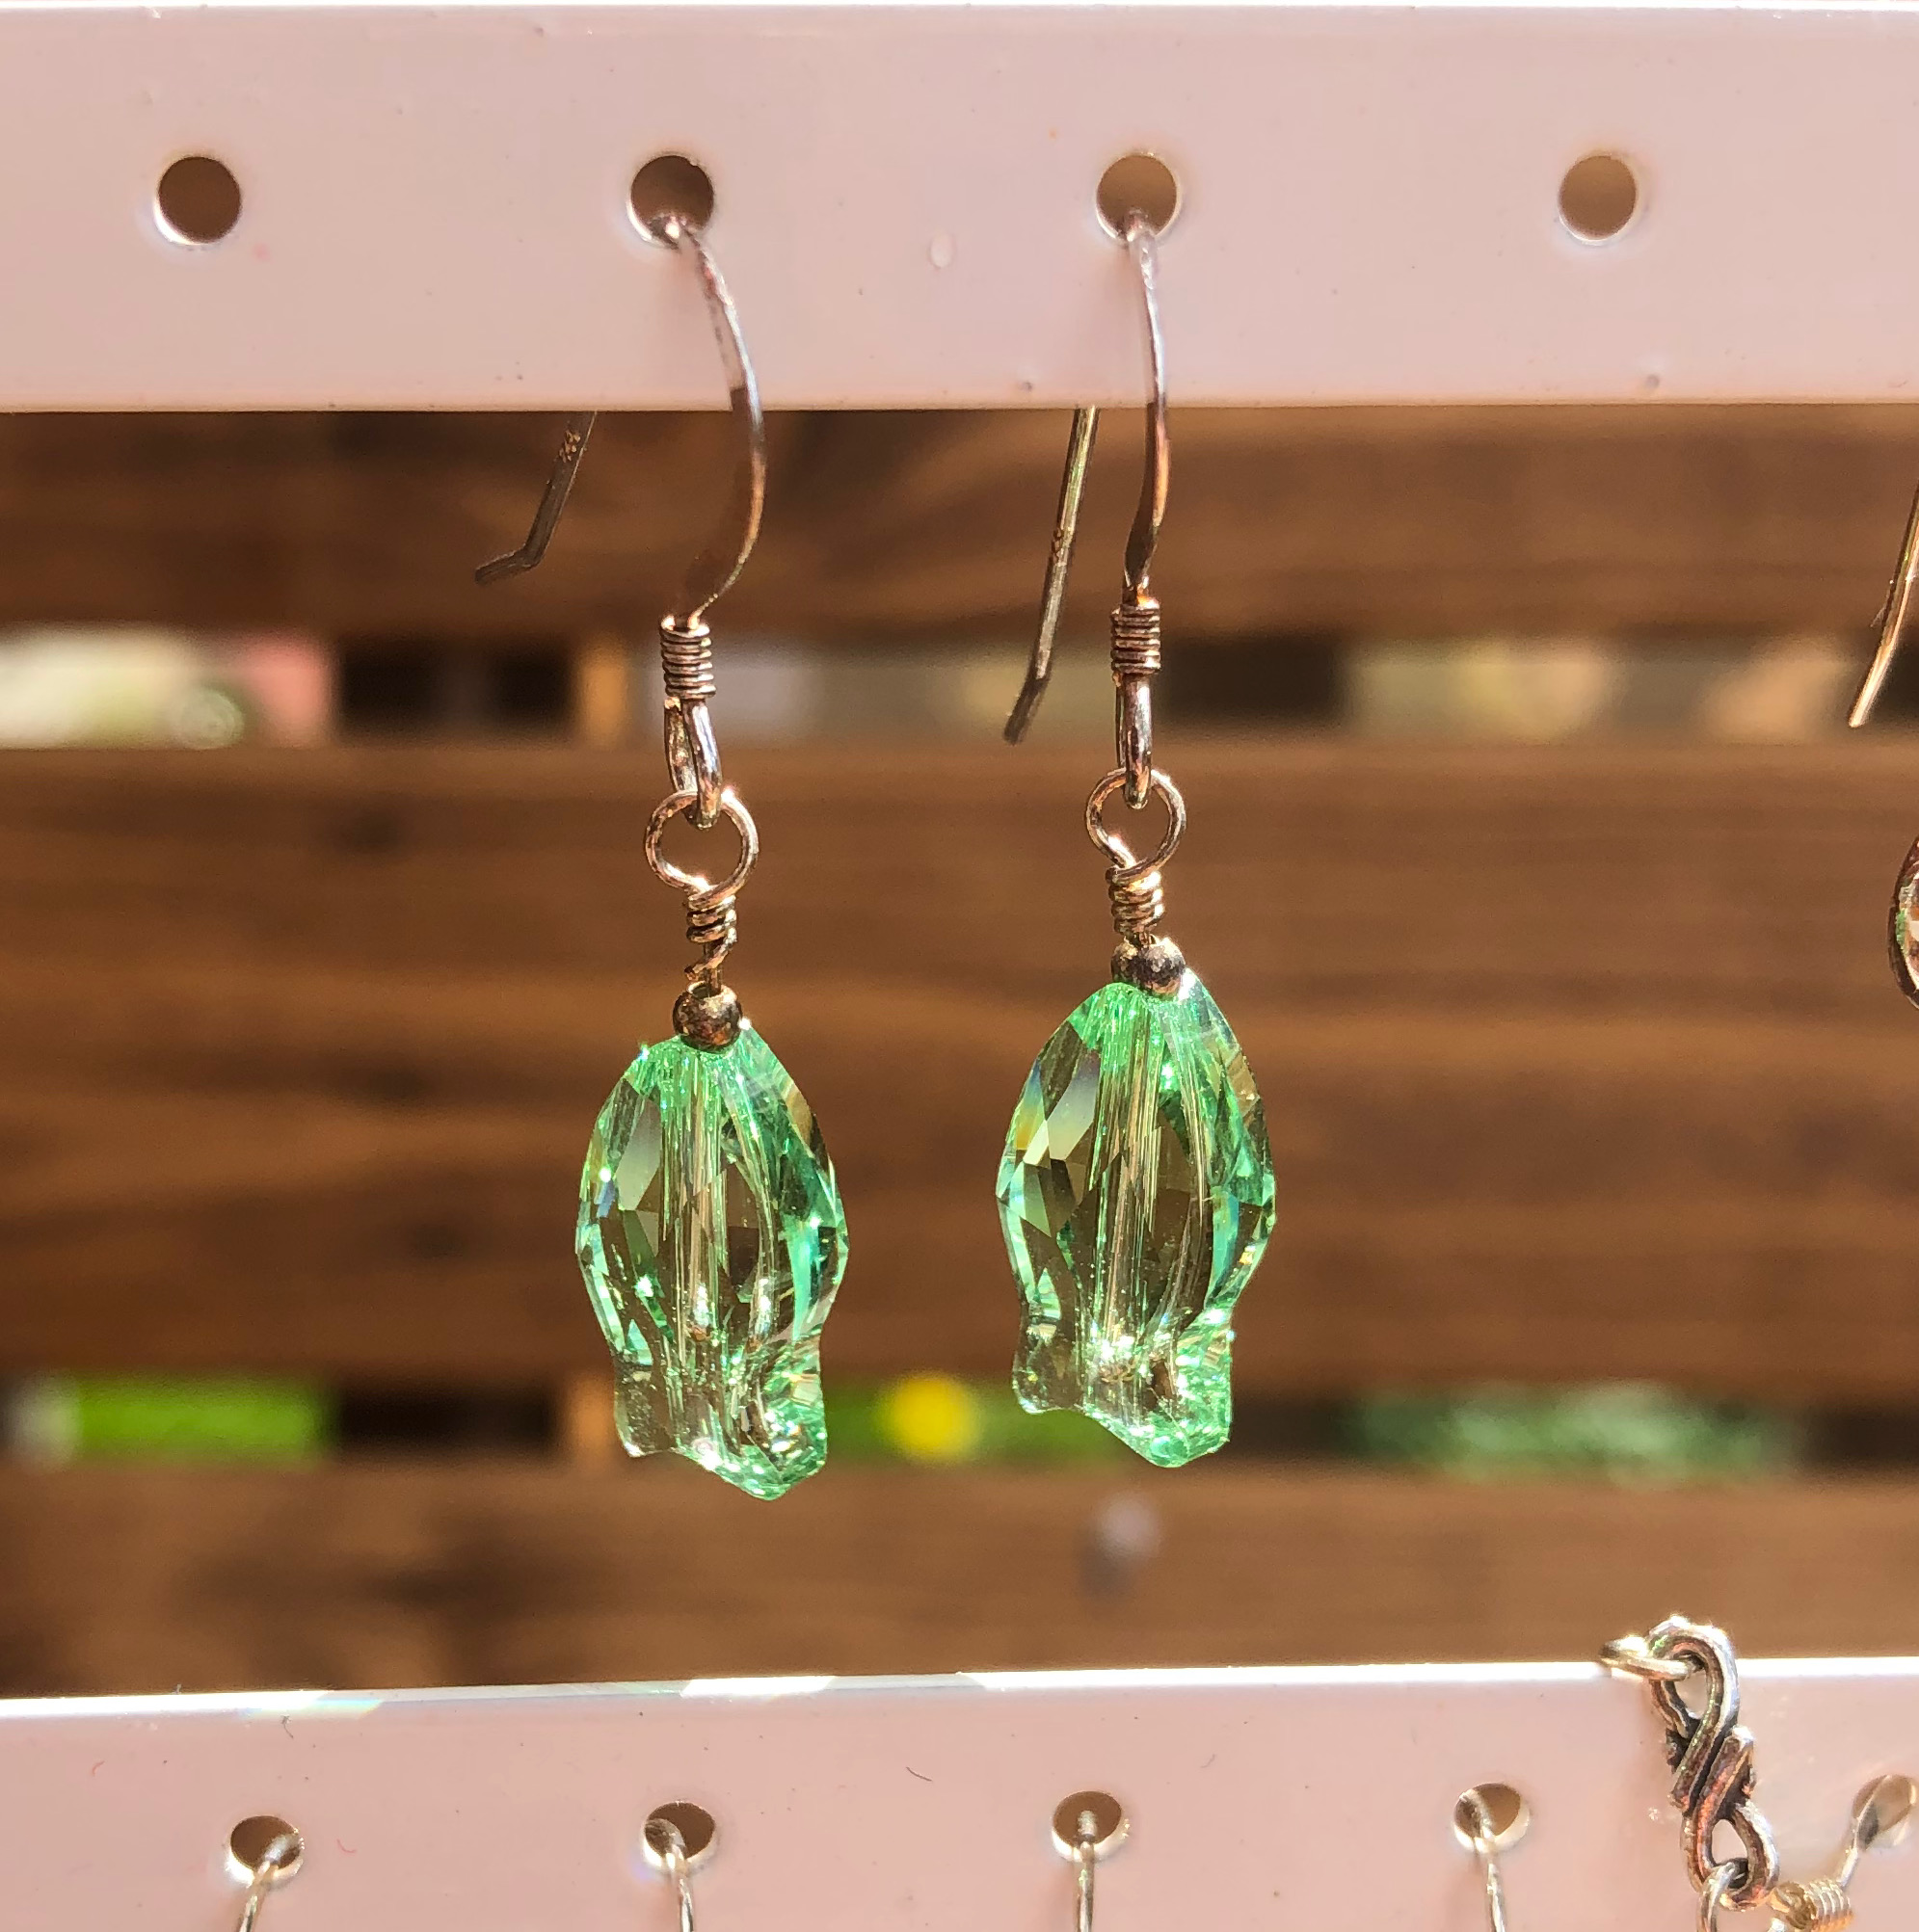 Earrings: Swarovski Fish 14mm Green